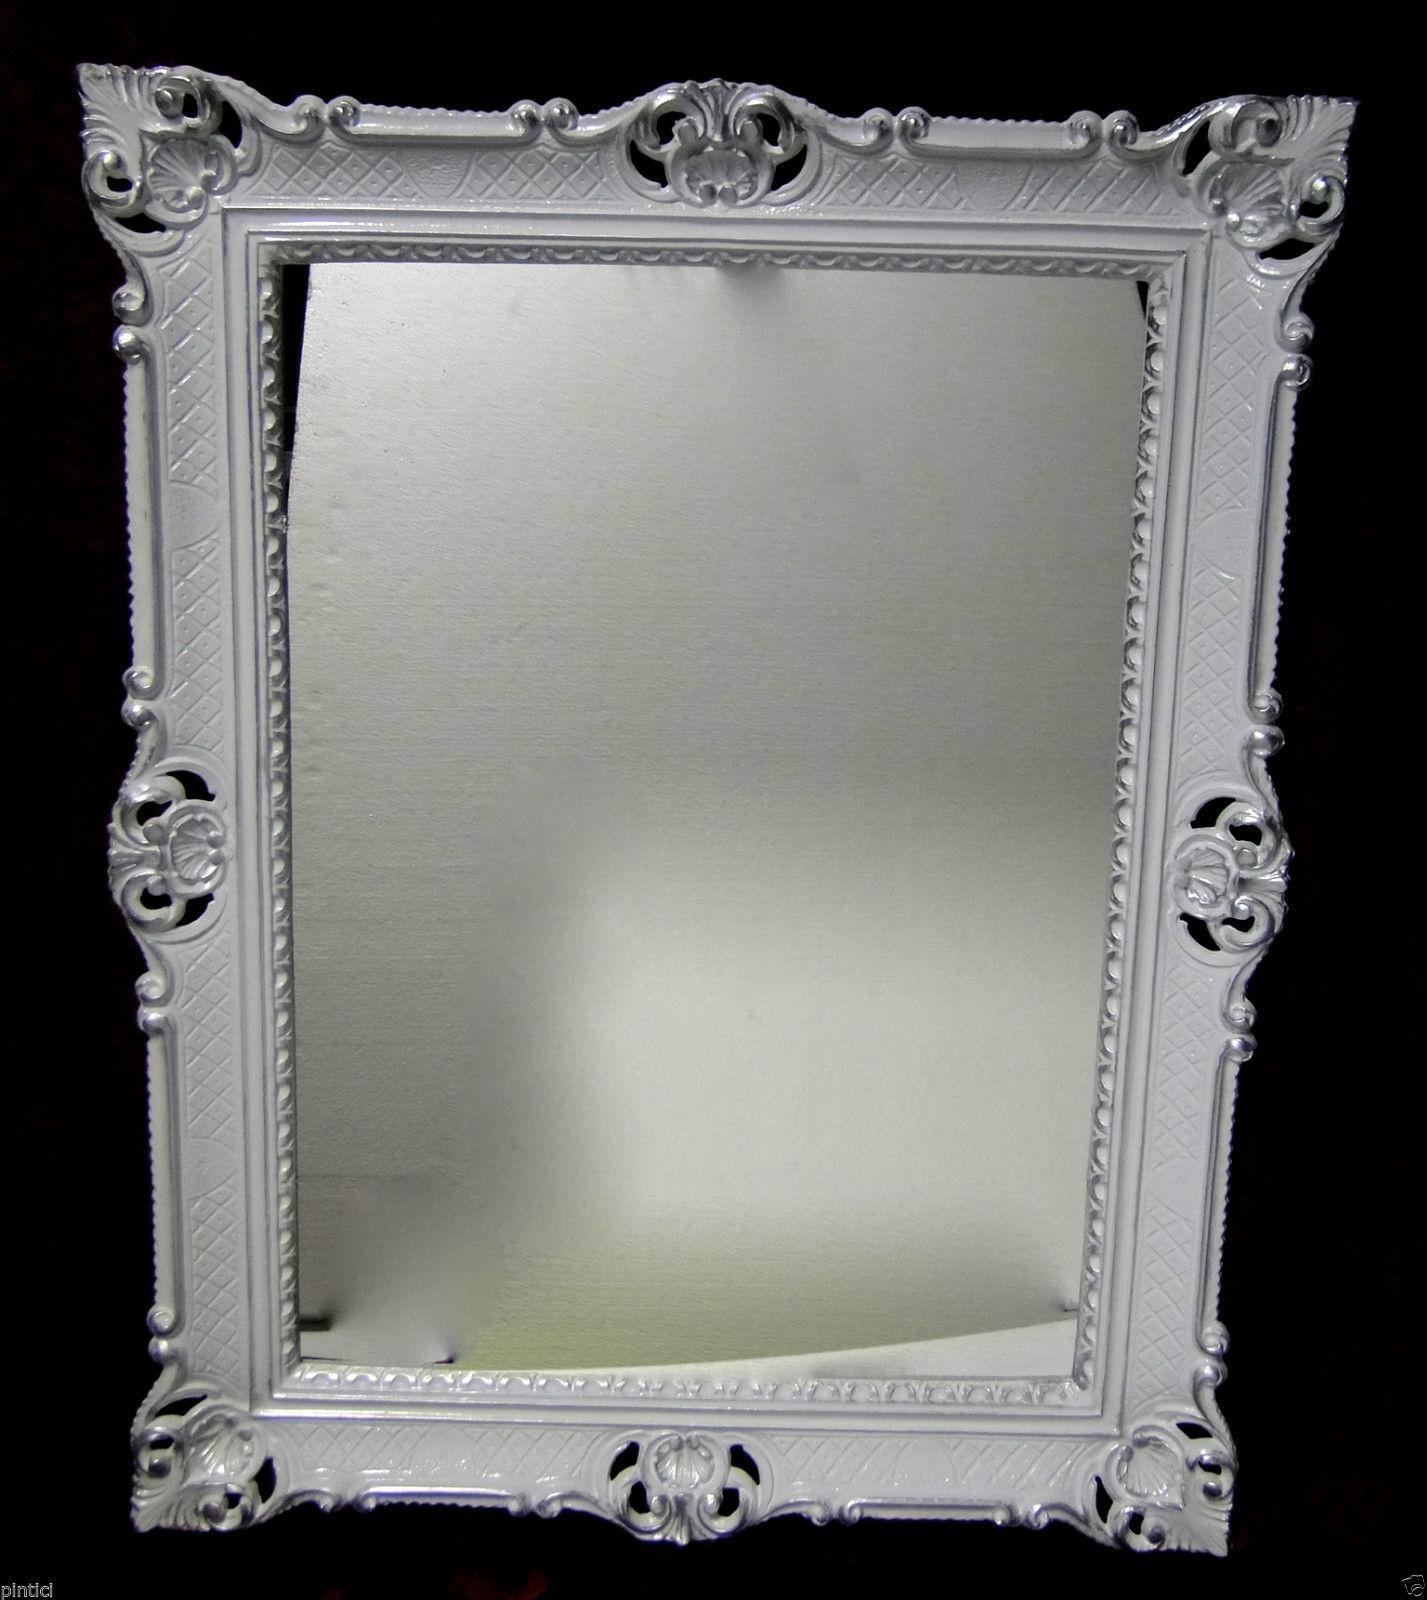 grosser spiegel cool grosser spiegel with grosser spiegel. Black Bedroom Furniture Sets. Home Design Ideas